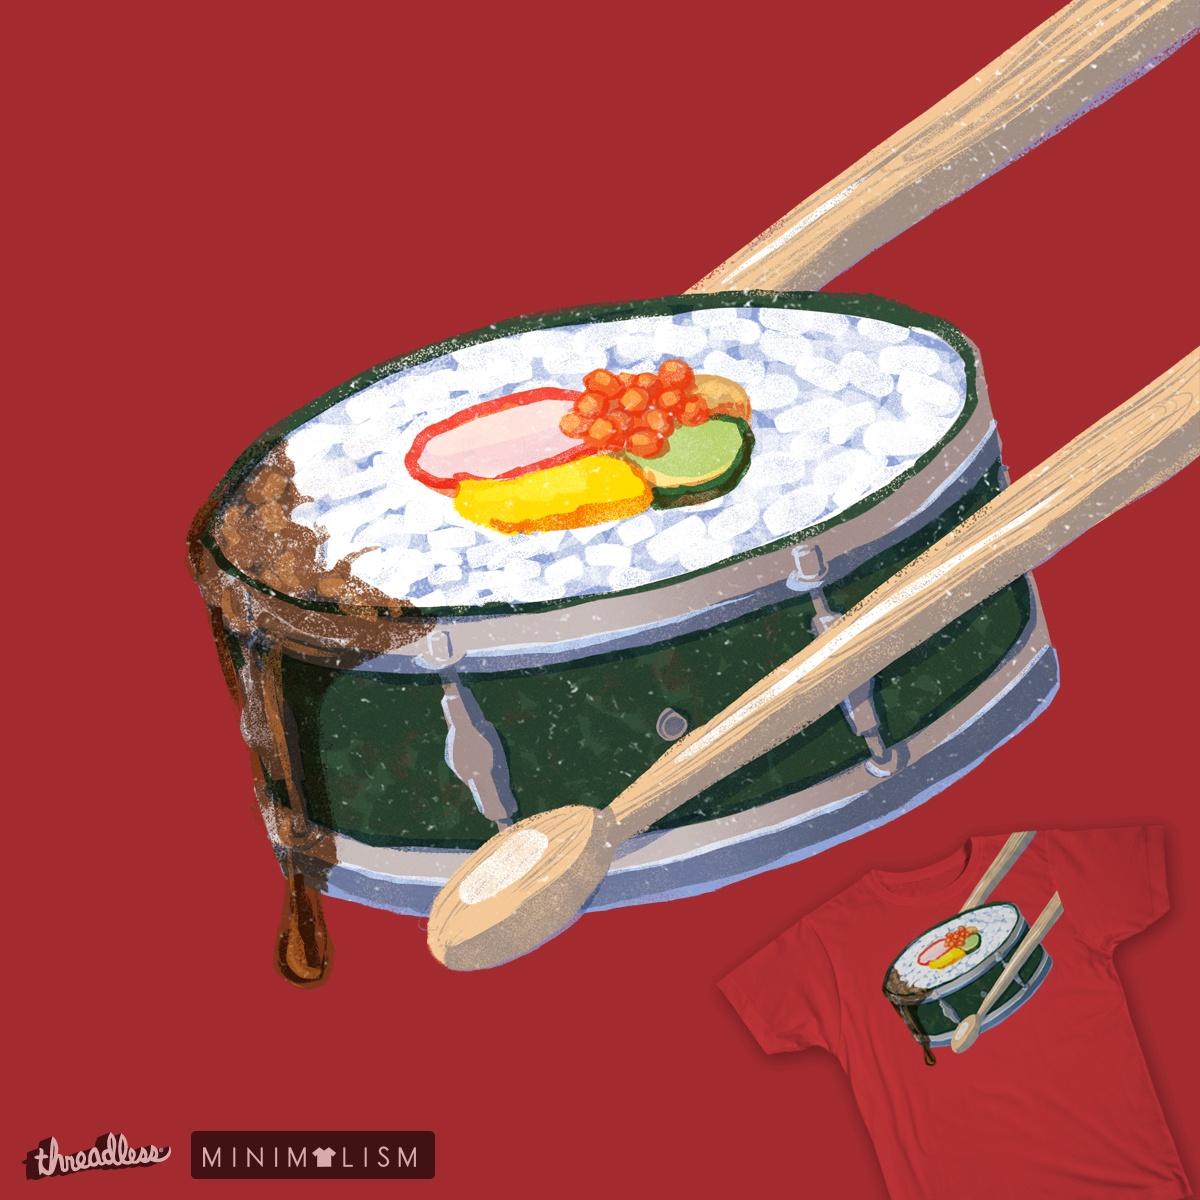 Drumming Japanese by danielansel on Threadless